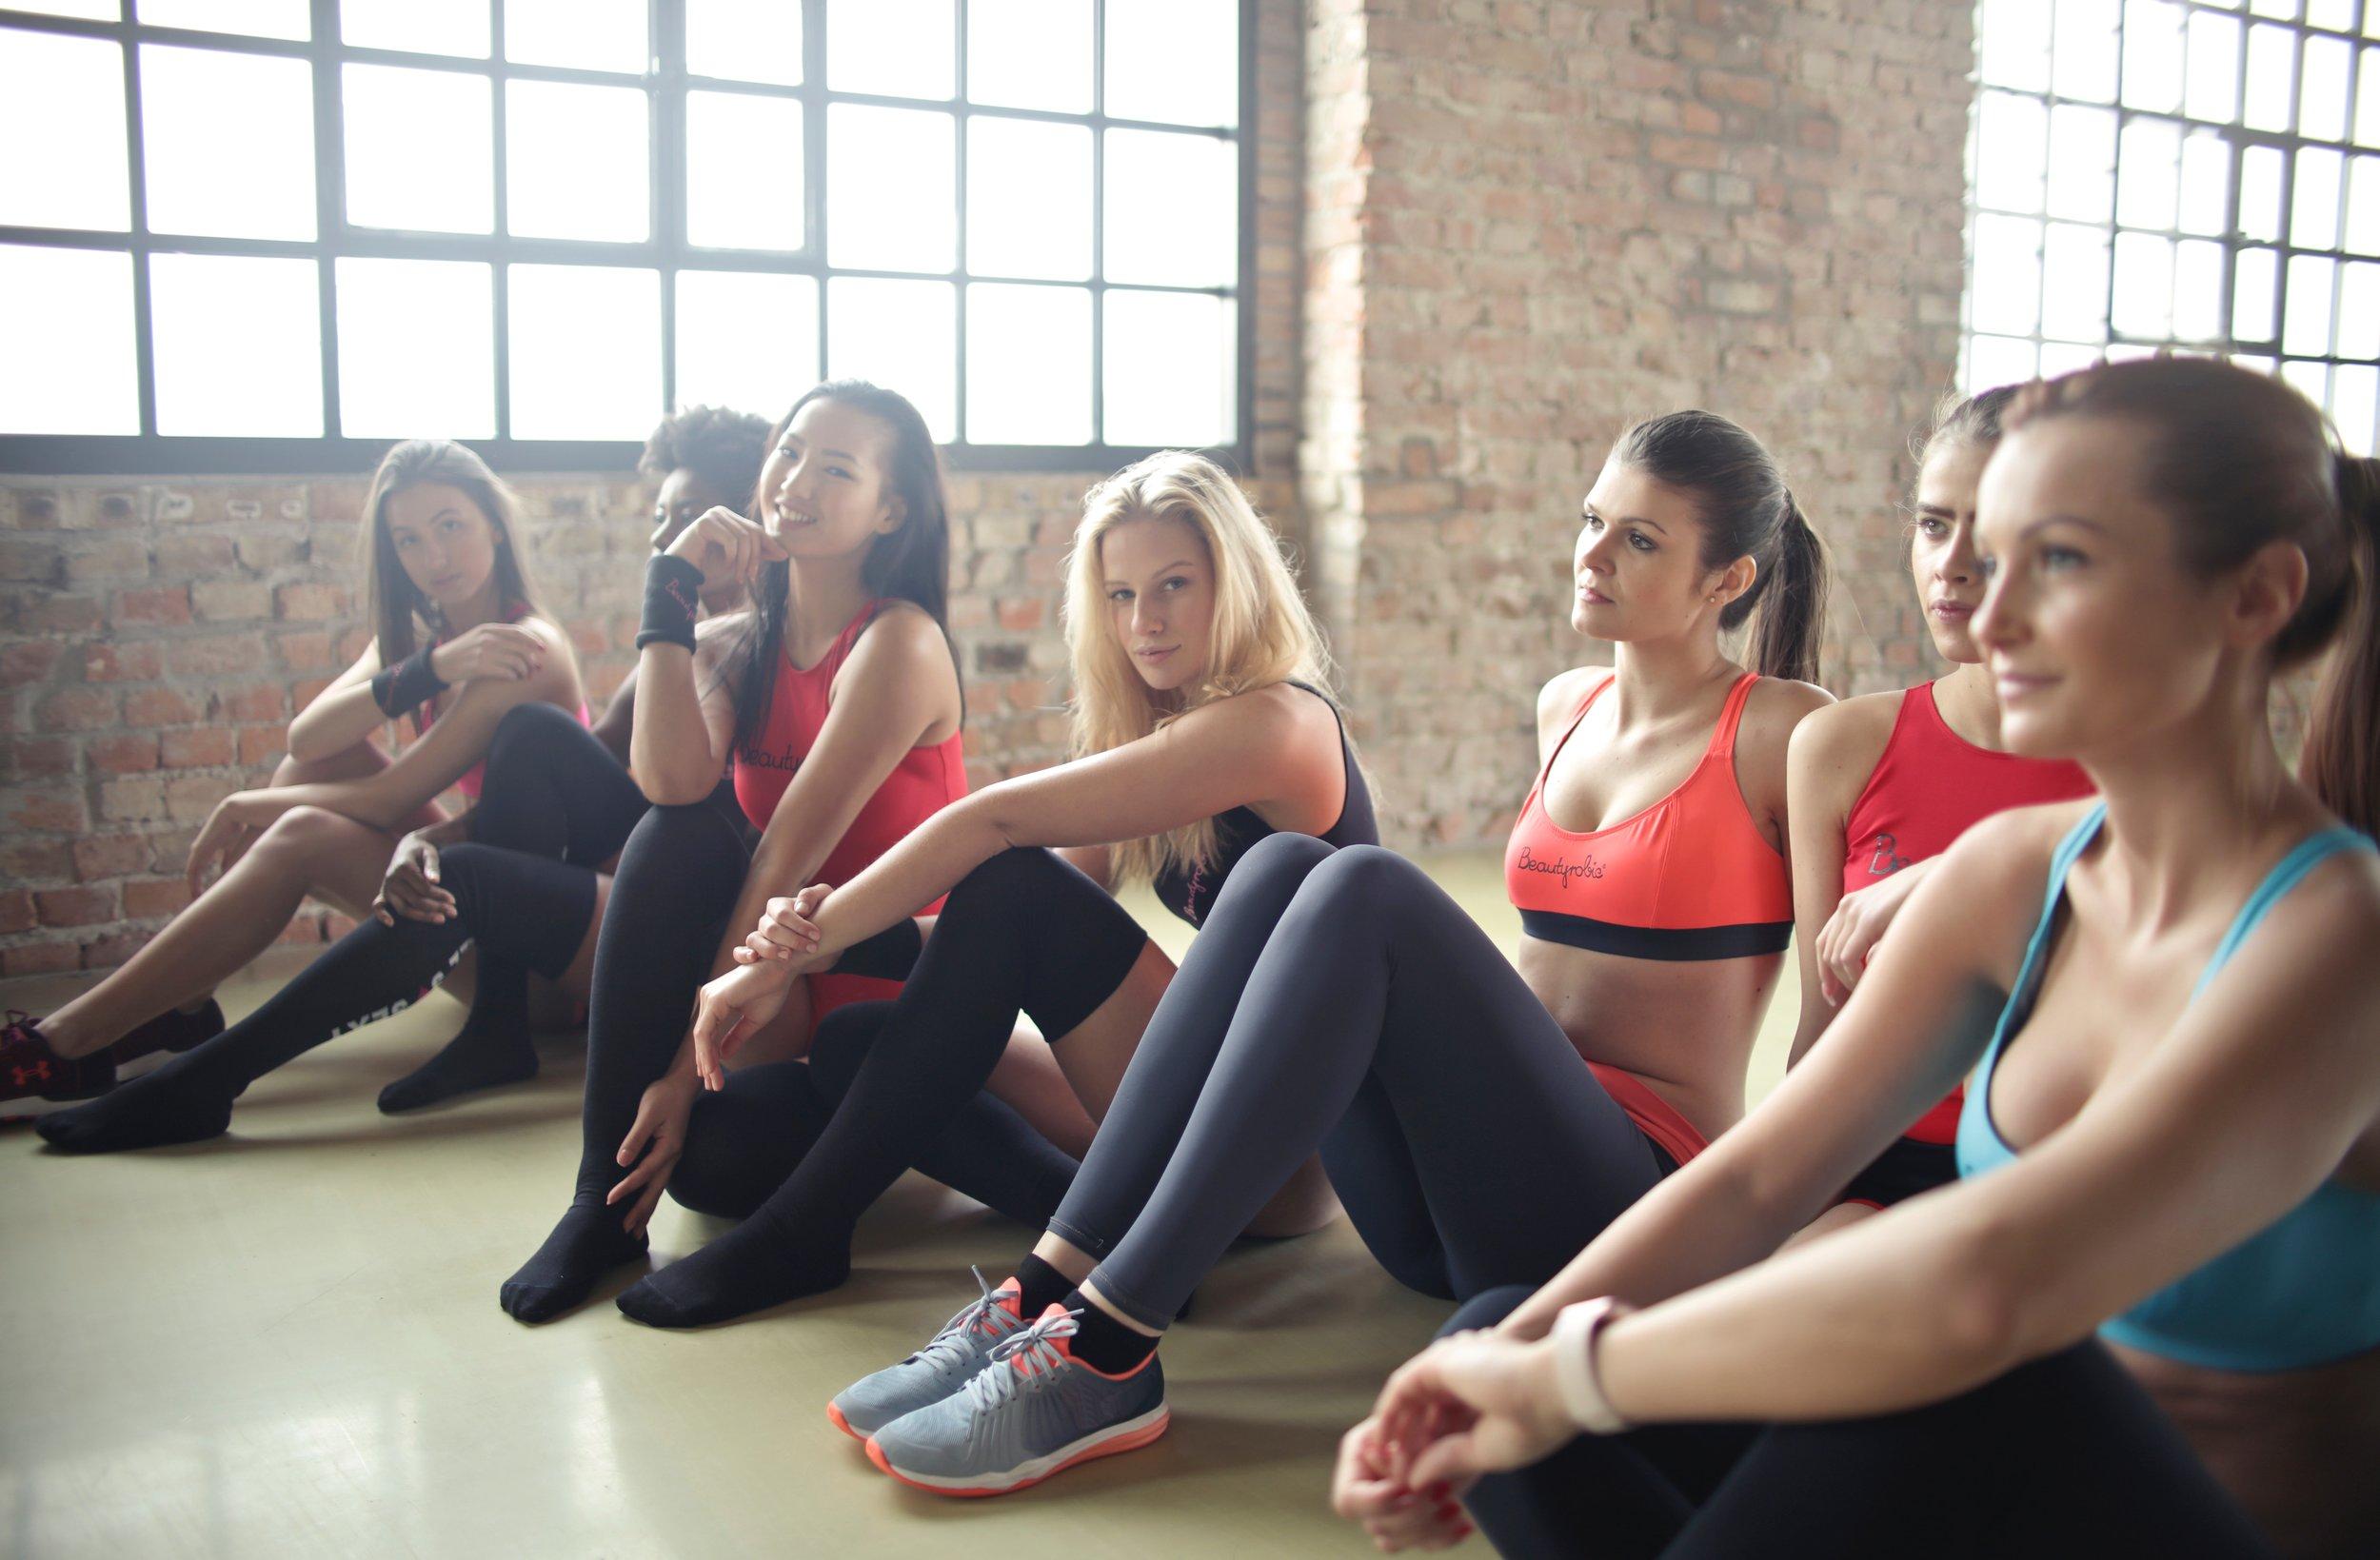 aerobic-class-exercise-866021.jpg